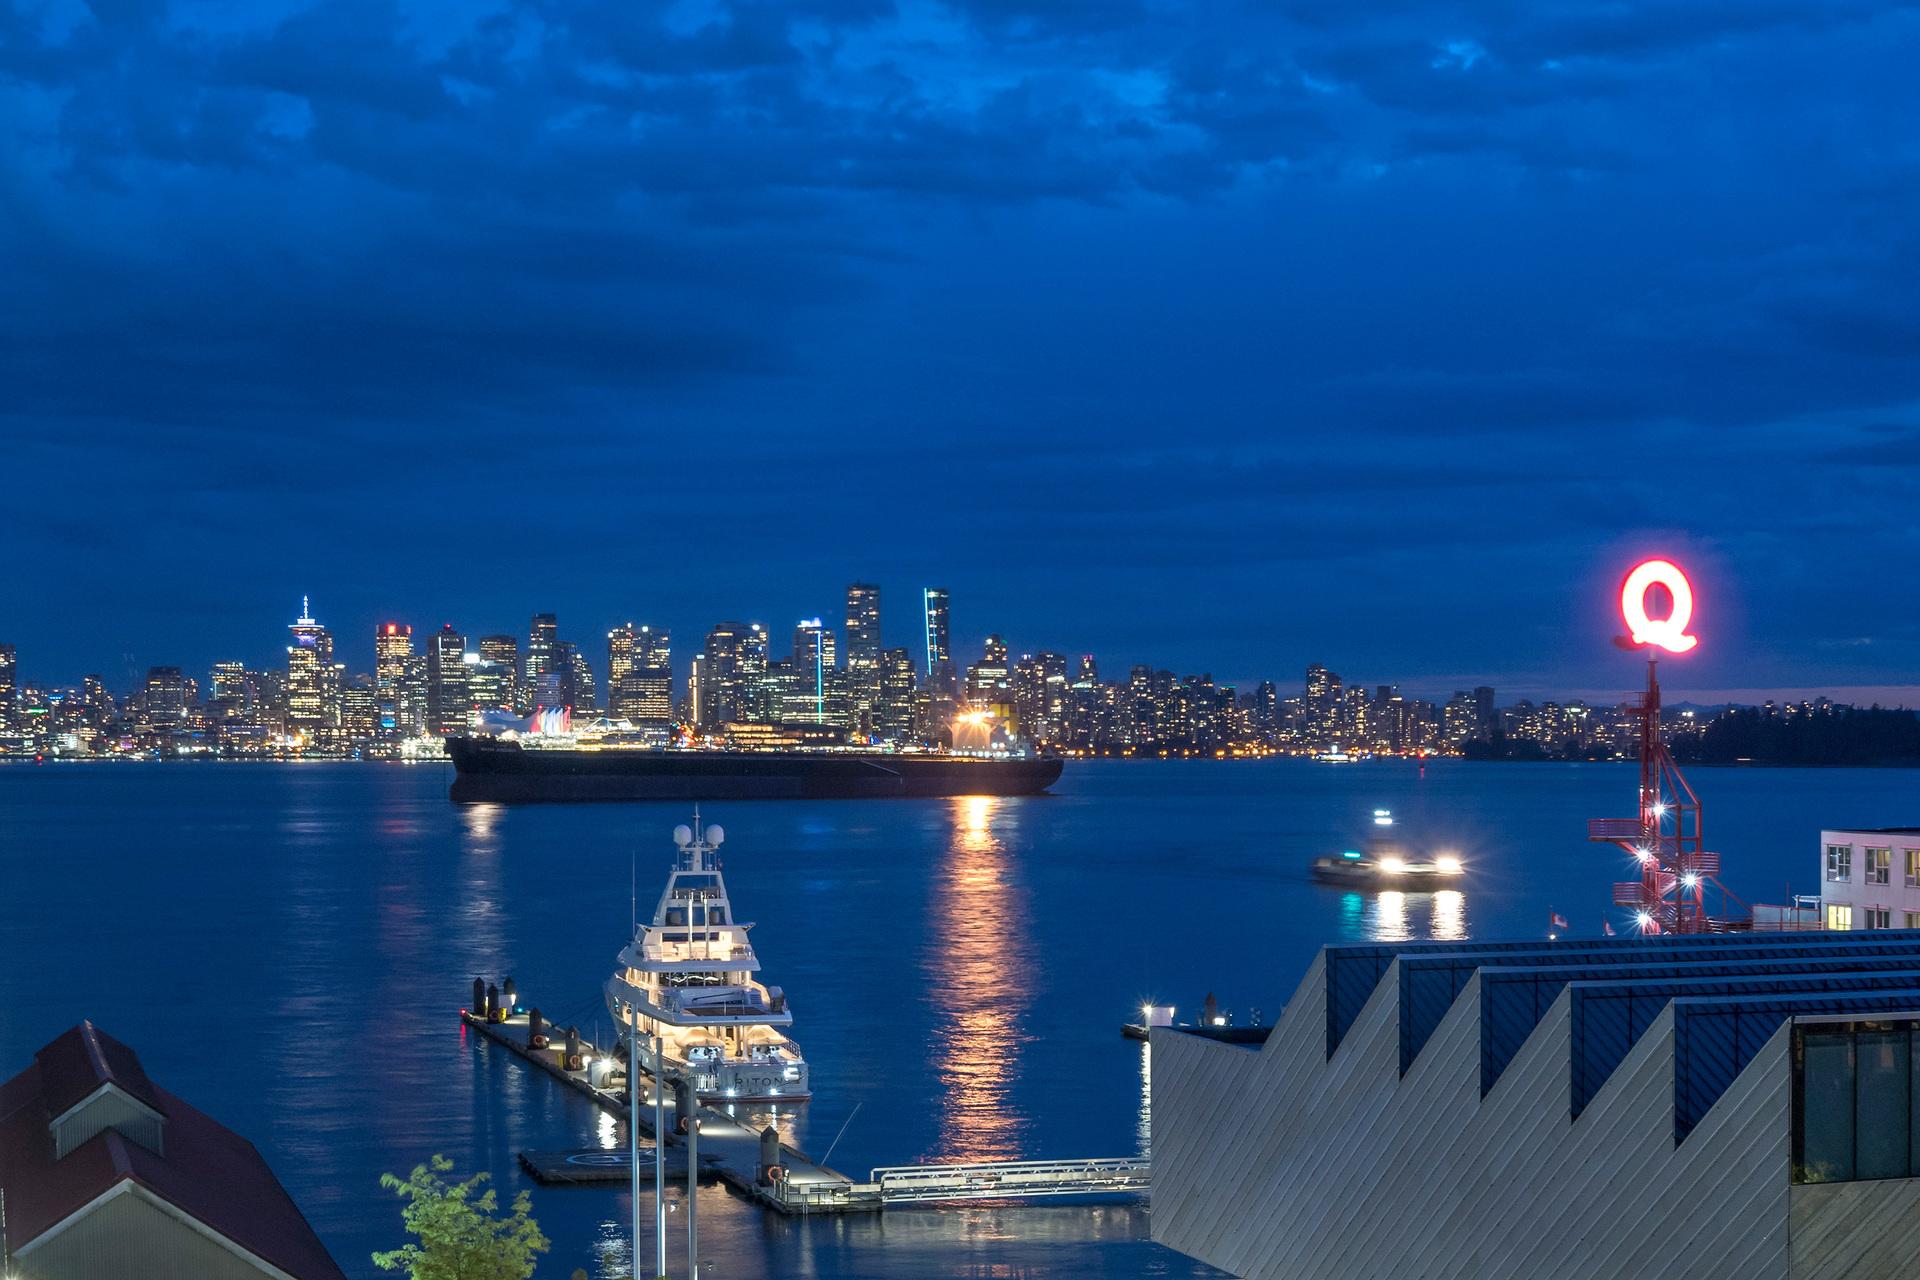 503-133-e-esplanade-ave-360hometours-22 at 503 - 133 E Esplanade, Lower Lonsdale, North Vancouver